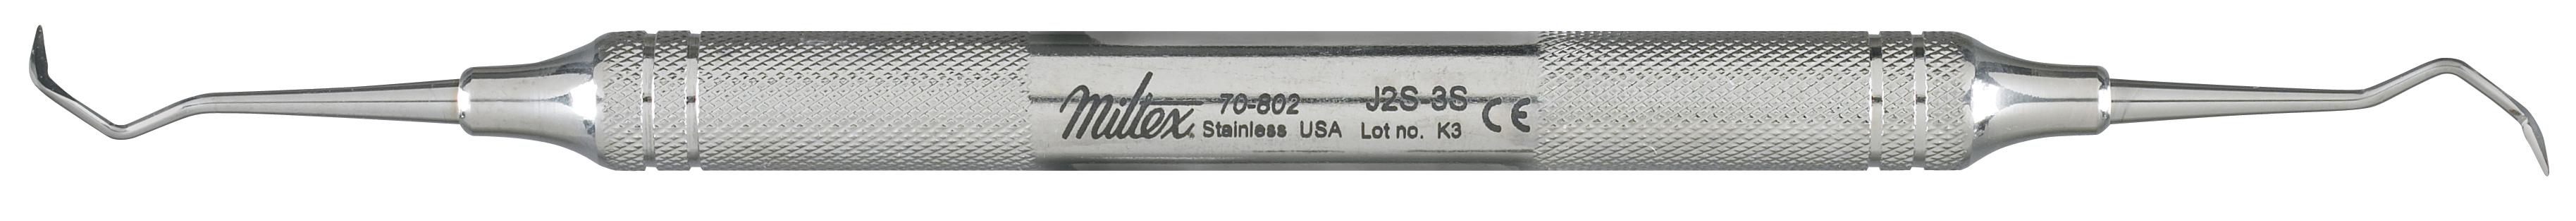 jaq-2s-3s-scaler-6-hndle-70-802-miltex.jpg